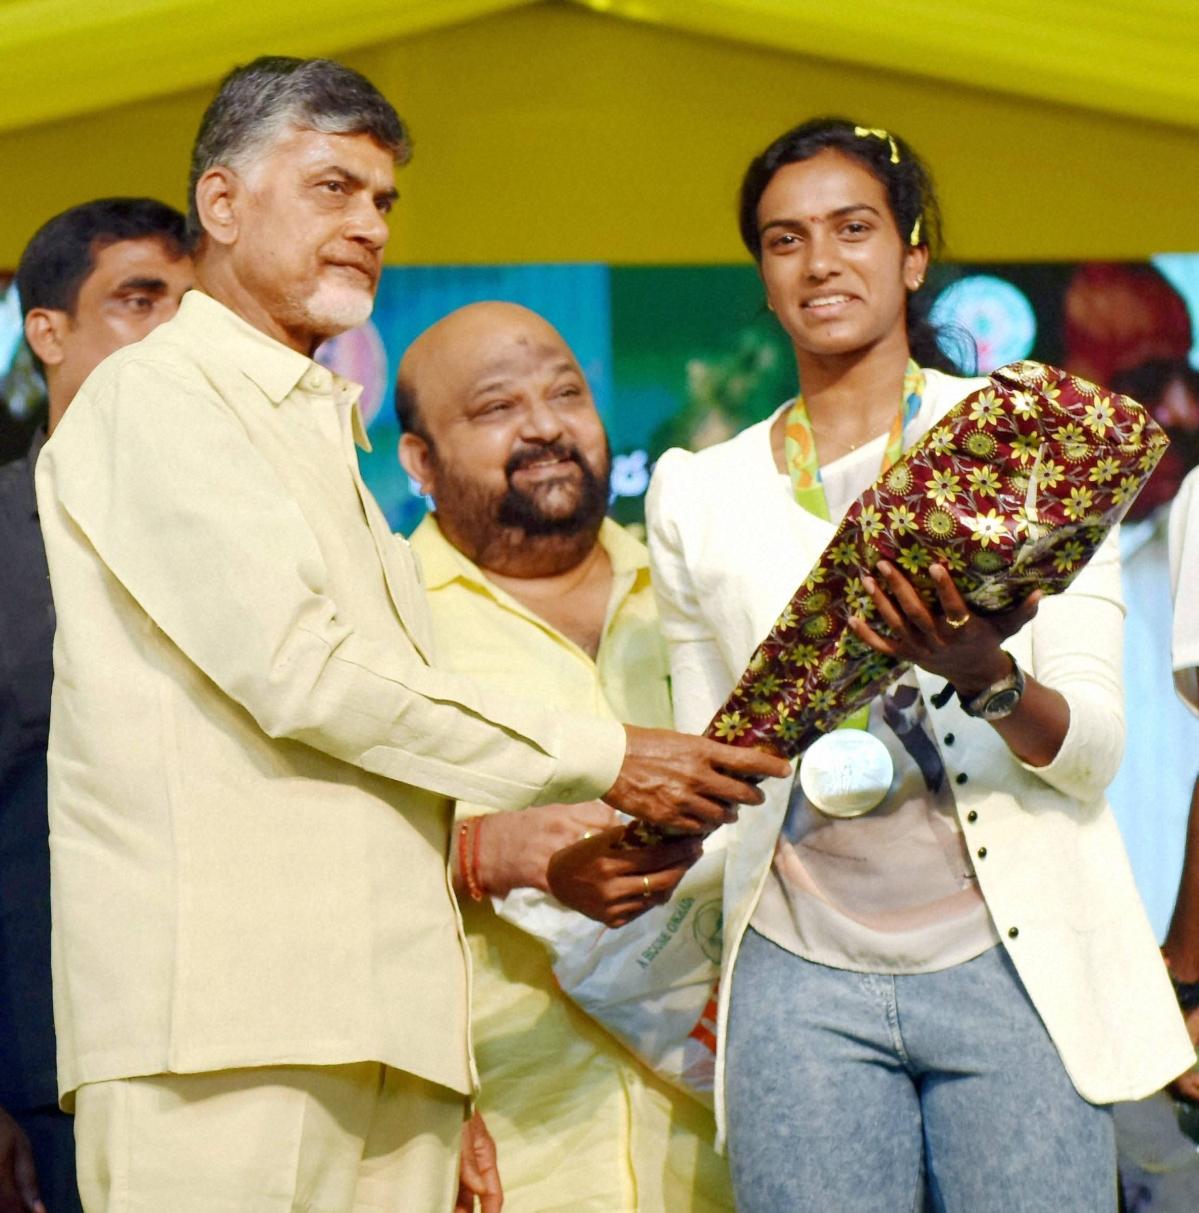 Ulta Pulta: Hail the new era in Indian sports